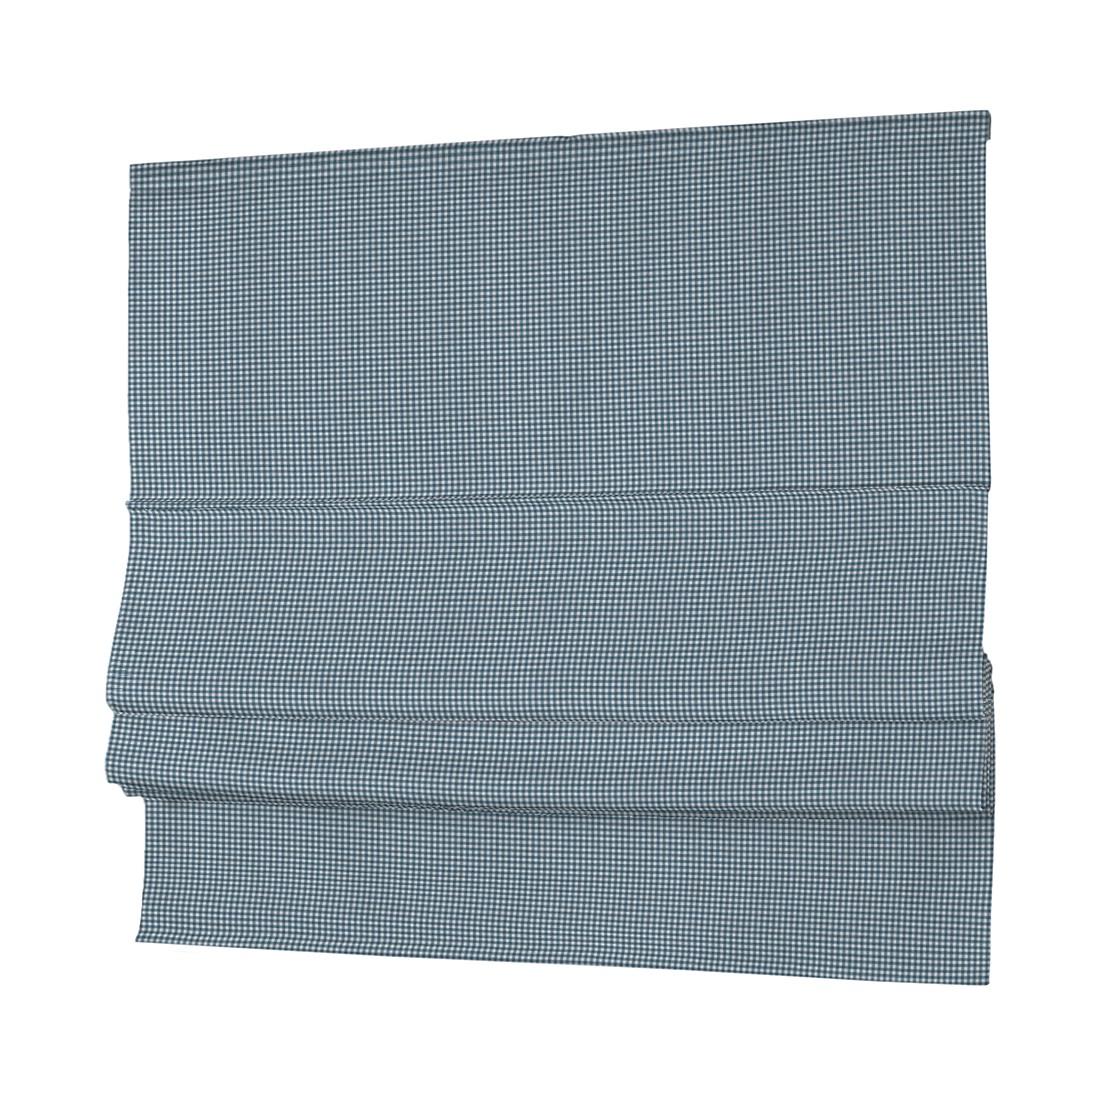 Rolgordijn Padva Amelie - Turquoise/wit - 80x170cm, Dekoria